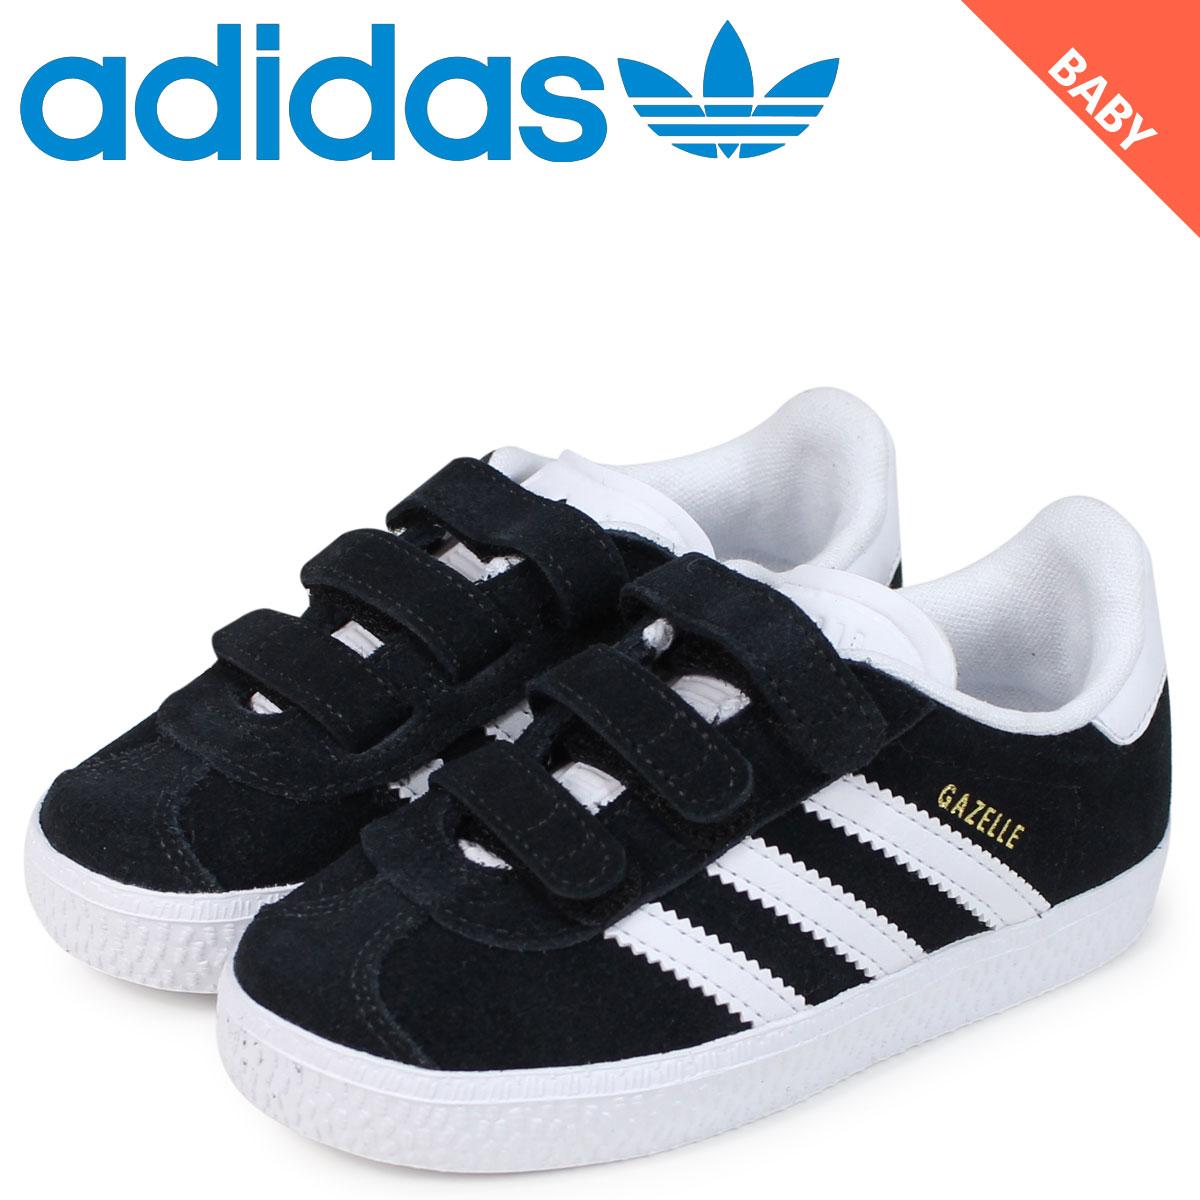 watch b8d01 32cf8 adidas Originals Adidas originals gazelle sneakers baby gut label black  GAZELLE CF I black CG3139 load planned Shinnyu load in reservation product  125 ...